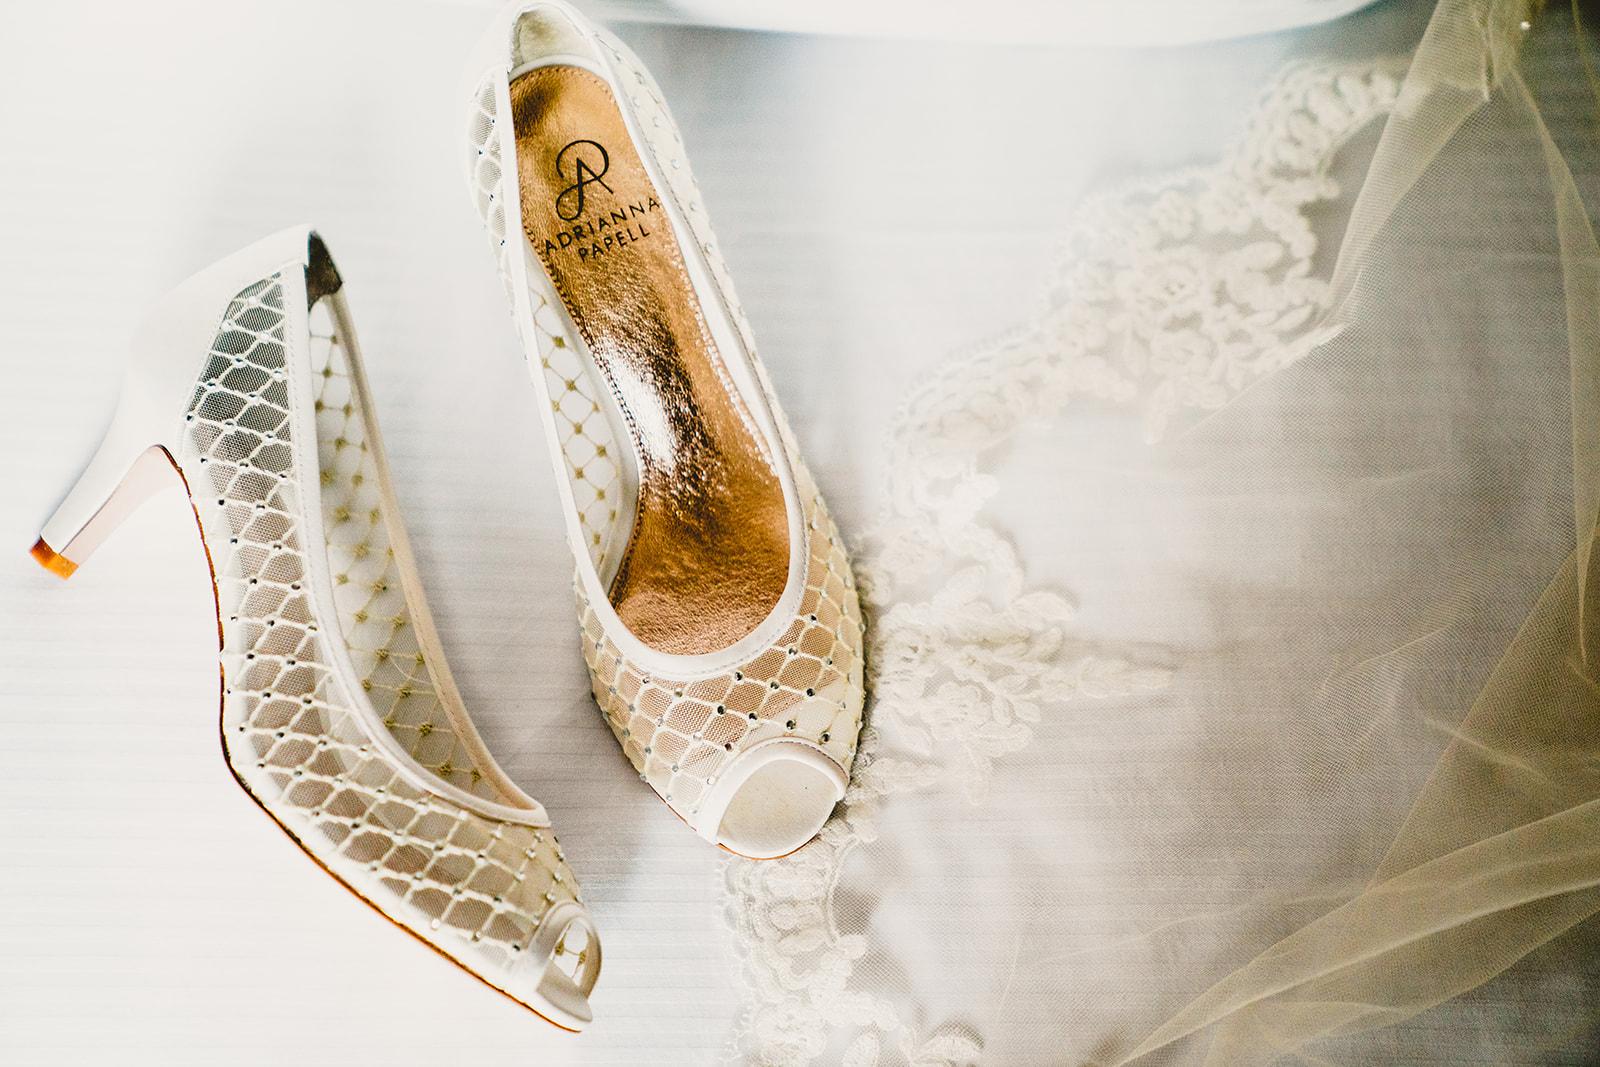 10-20-18-Katy-Kevin-Wedding-Embassy_Suites-Alexandria-VA-1039_websize.jpg